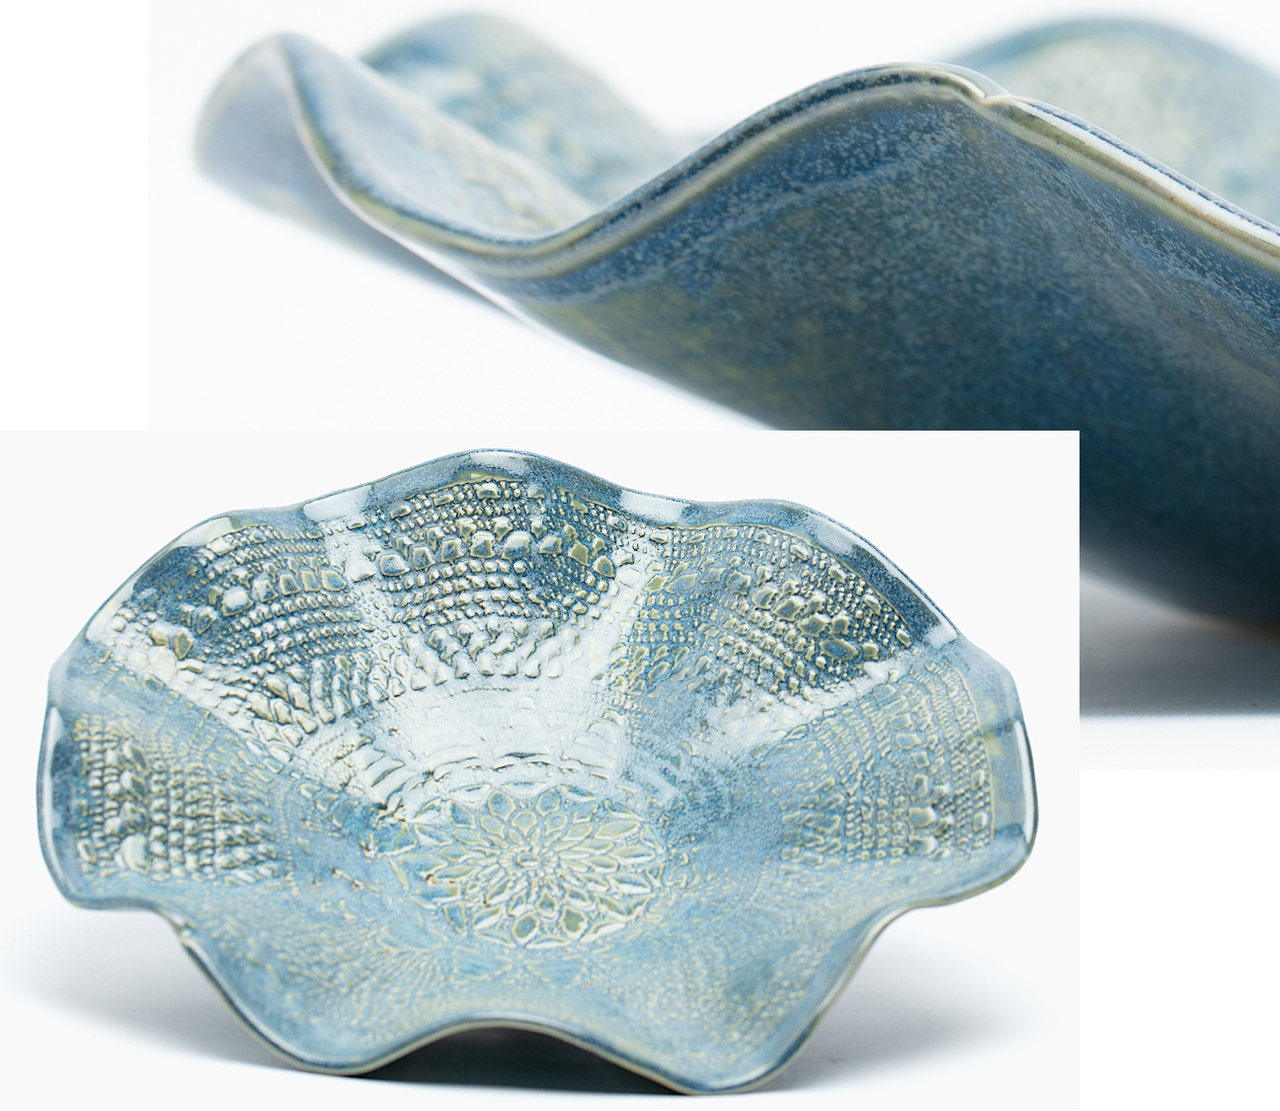 Scalloped Pottery Bowl